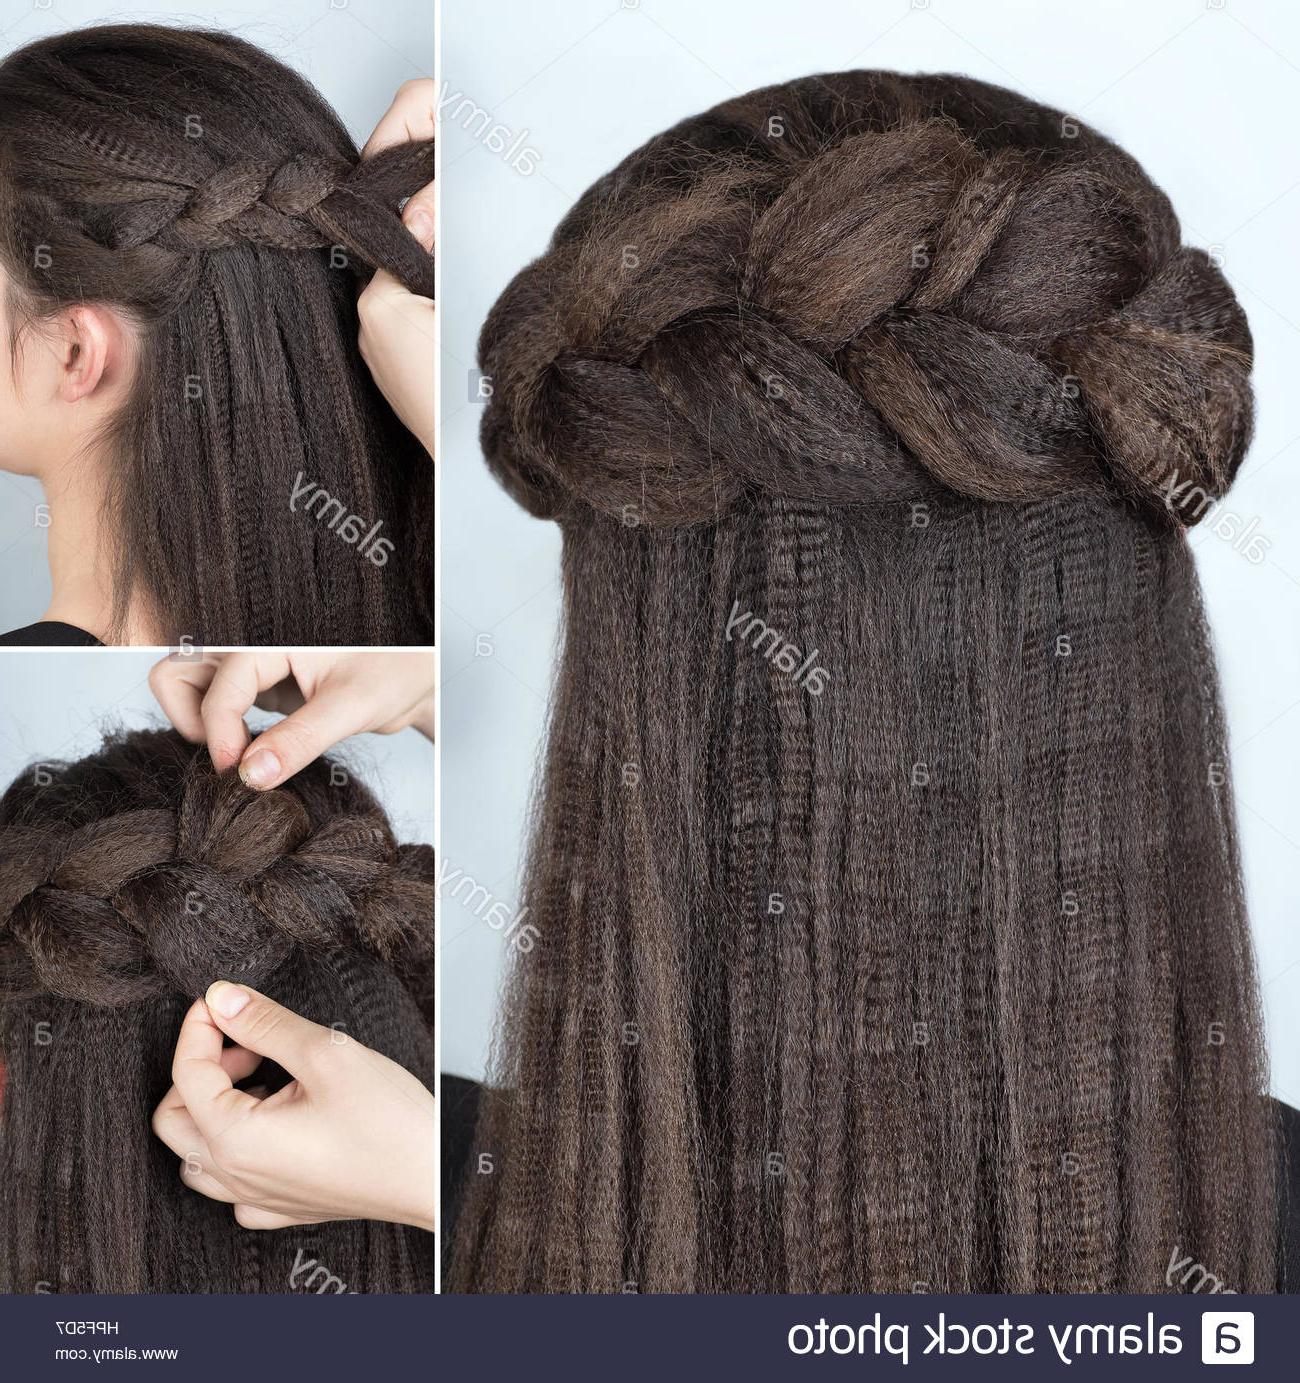 Process Of Weaving Braid. Hairstyle For Long Hair. Boho Regarding Most Popular Boho Half Braid Hairstyles (Gallery 18 of 20)